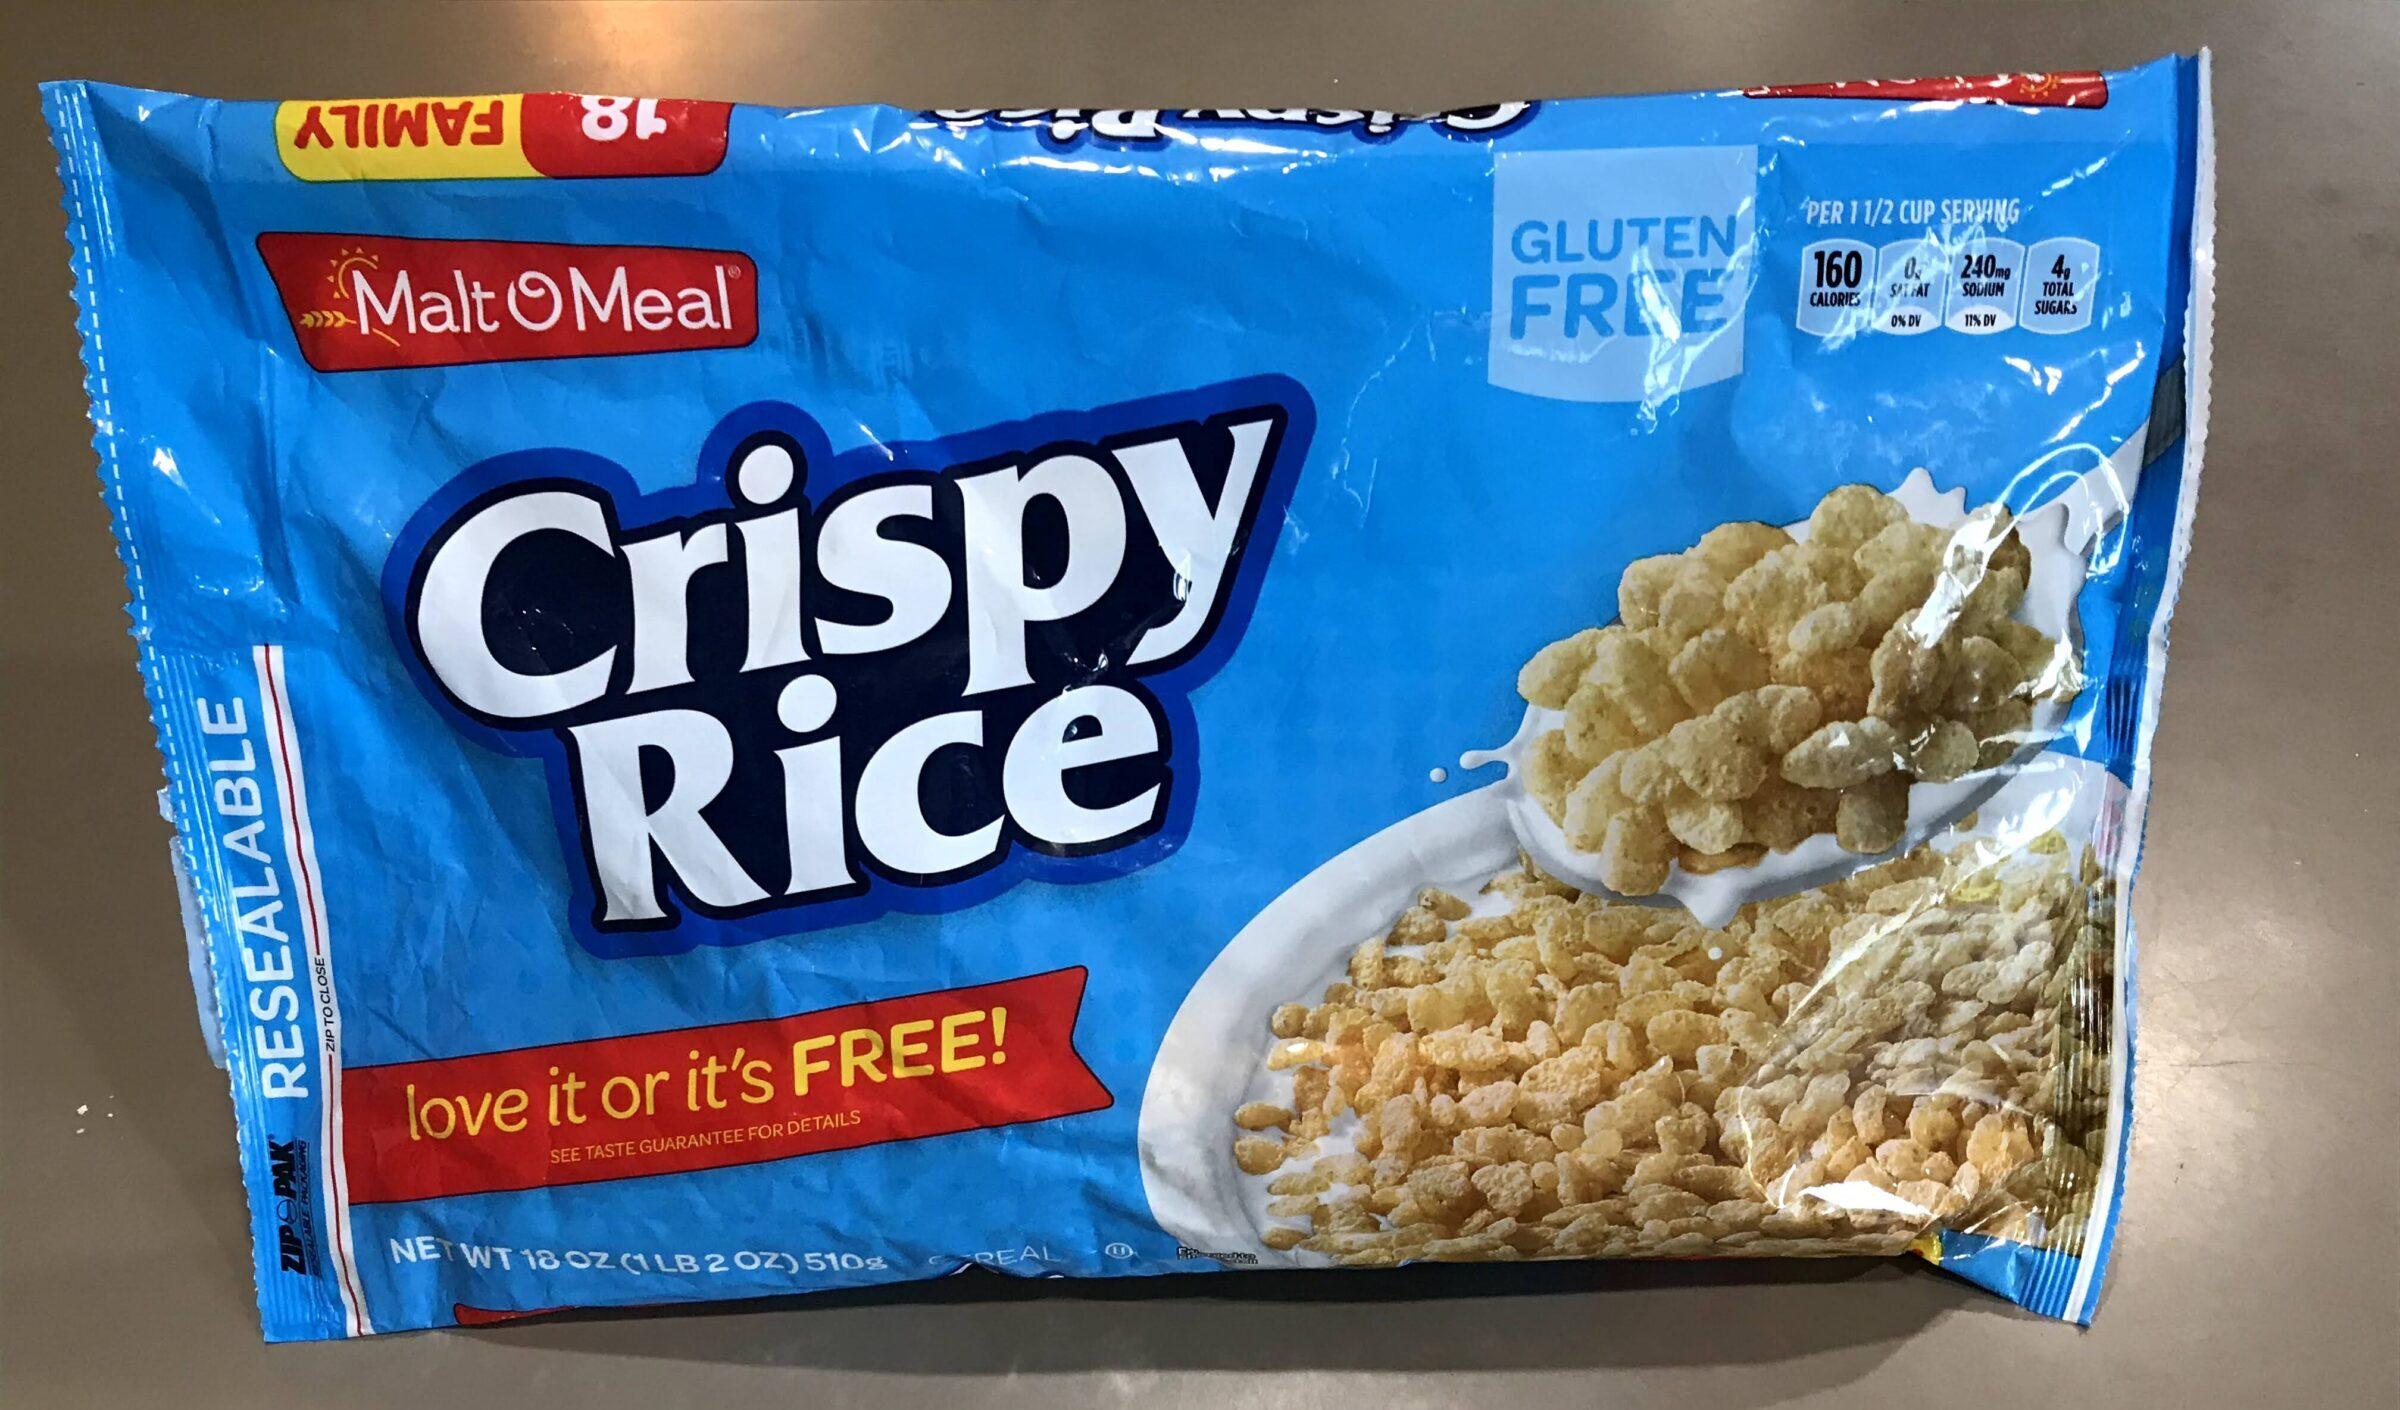 Gluten free Malt O Meal crispy rice cereal